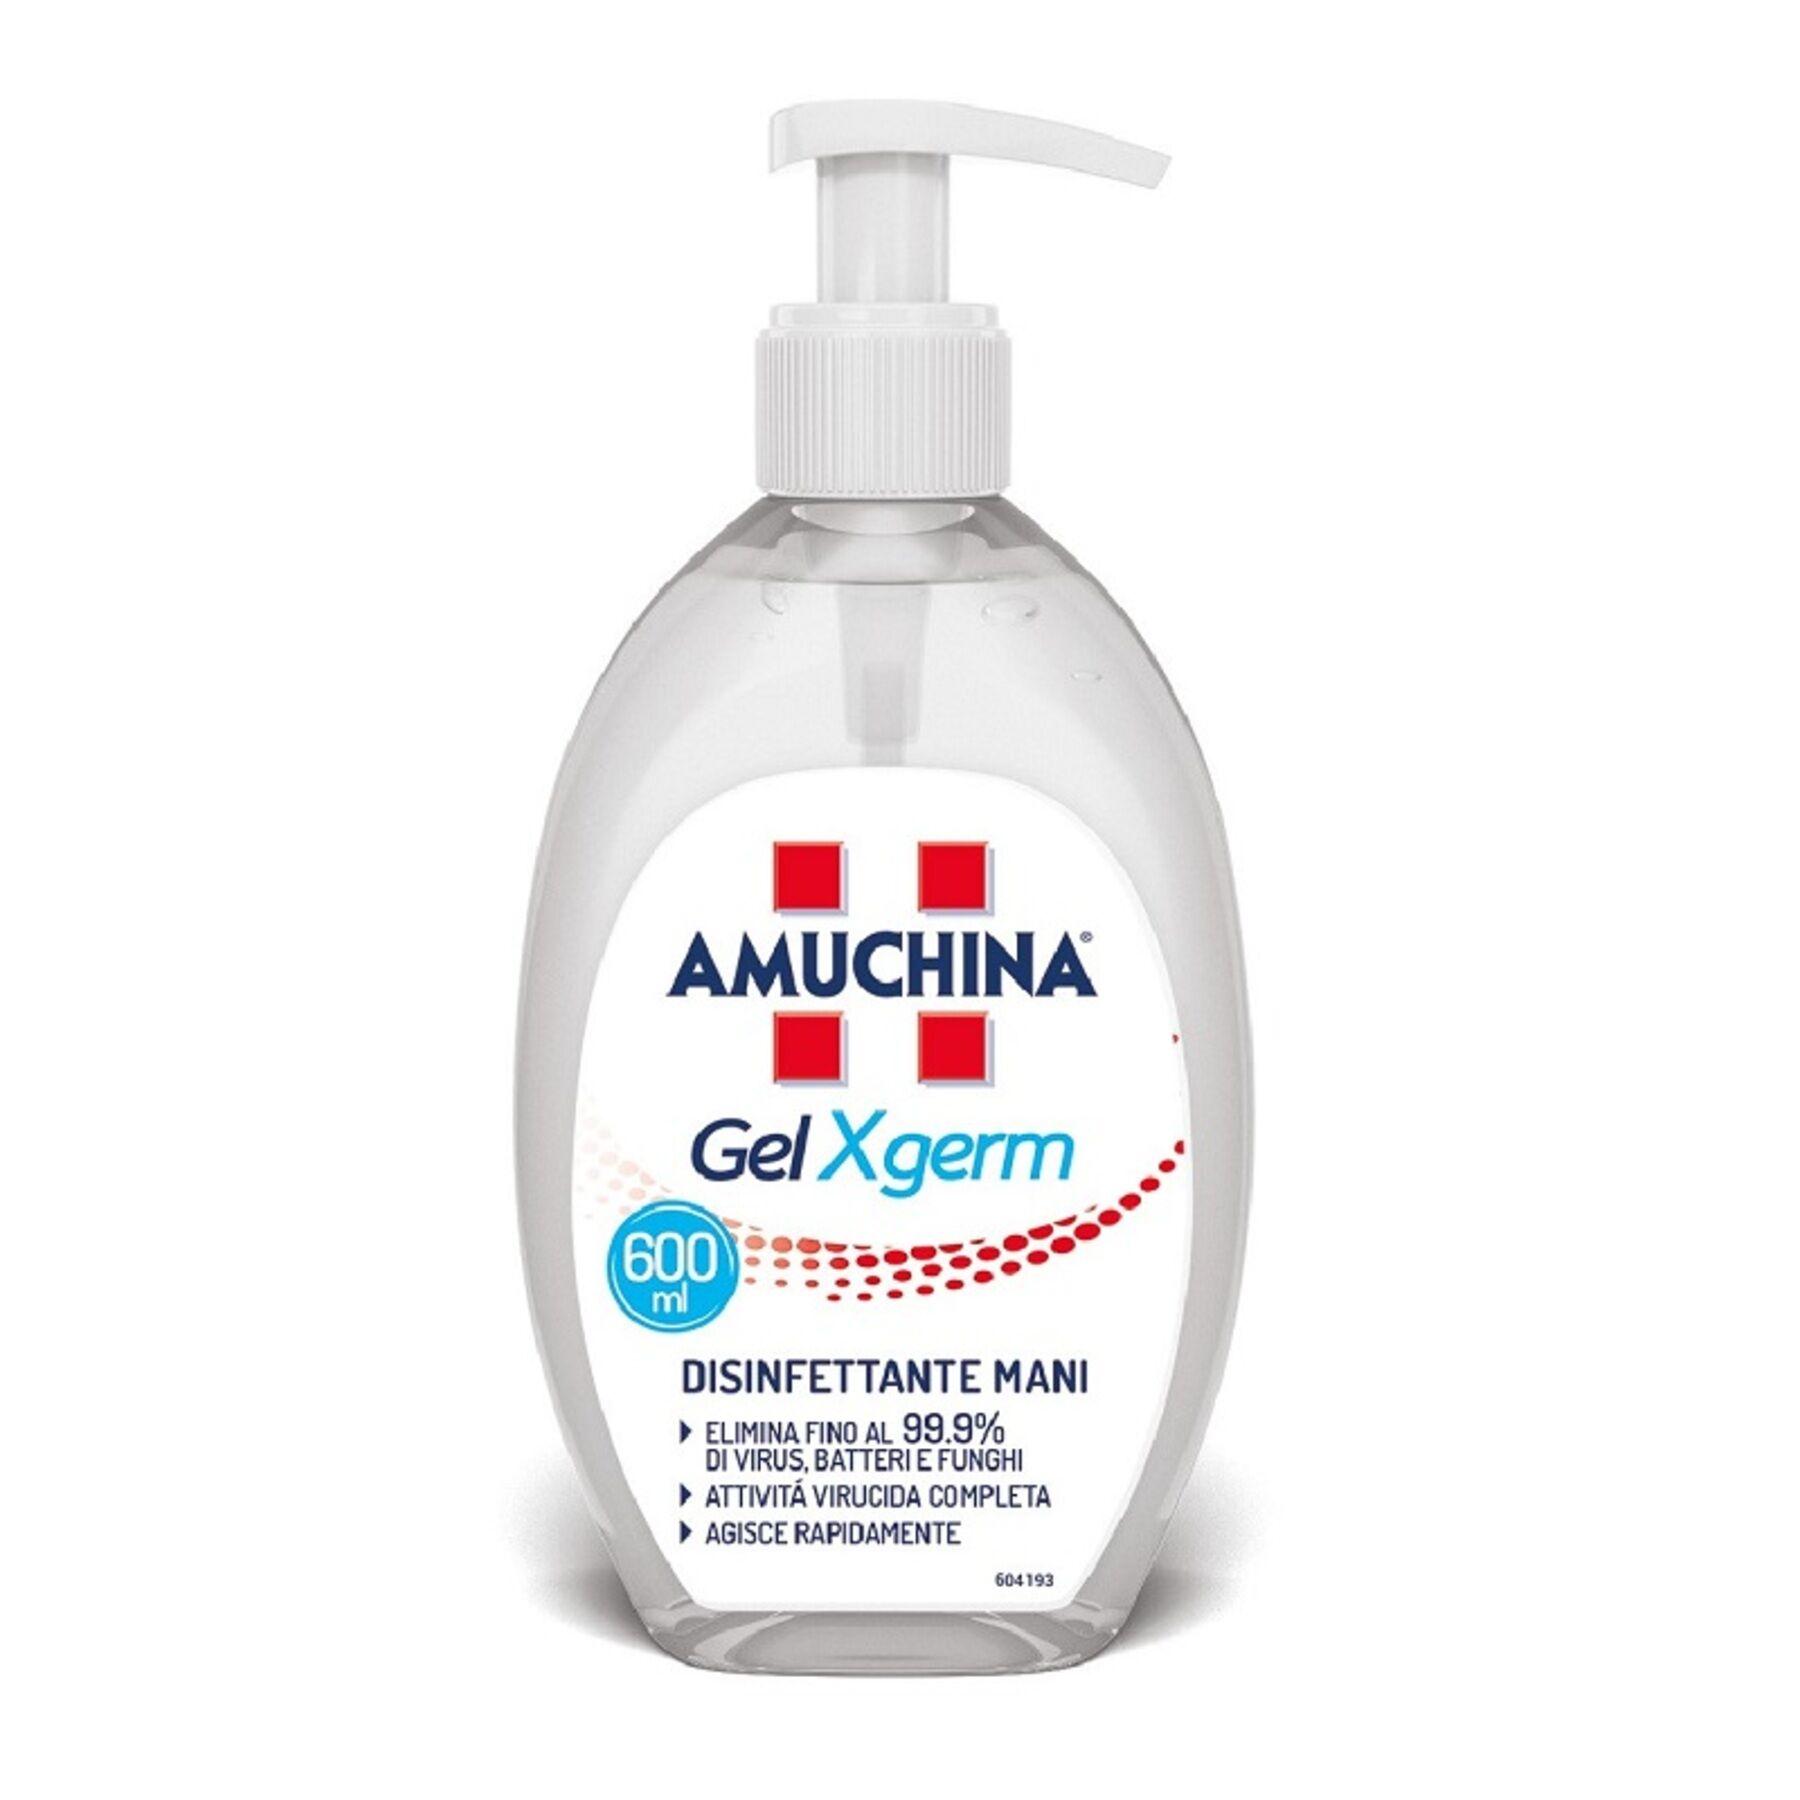 angelini amuchina gel disinfettante mani antisettico x germ (600 ml)